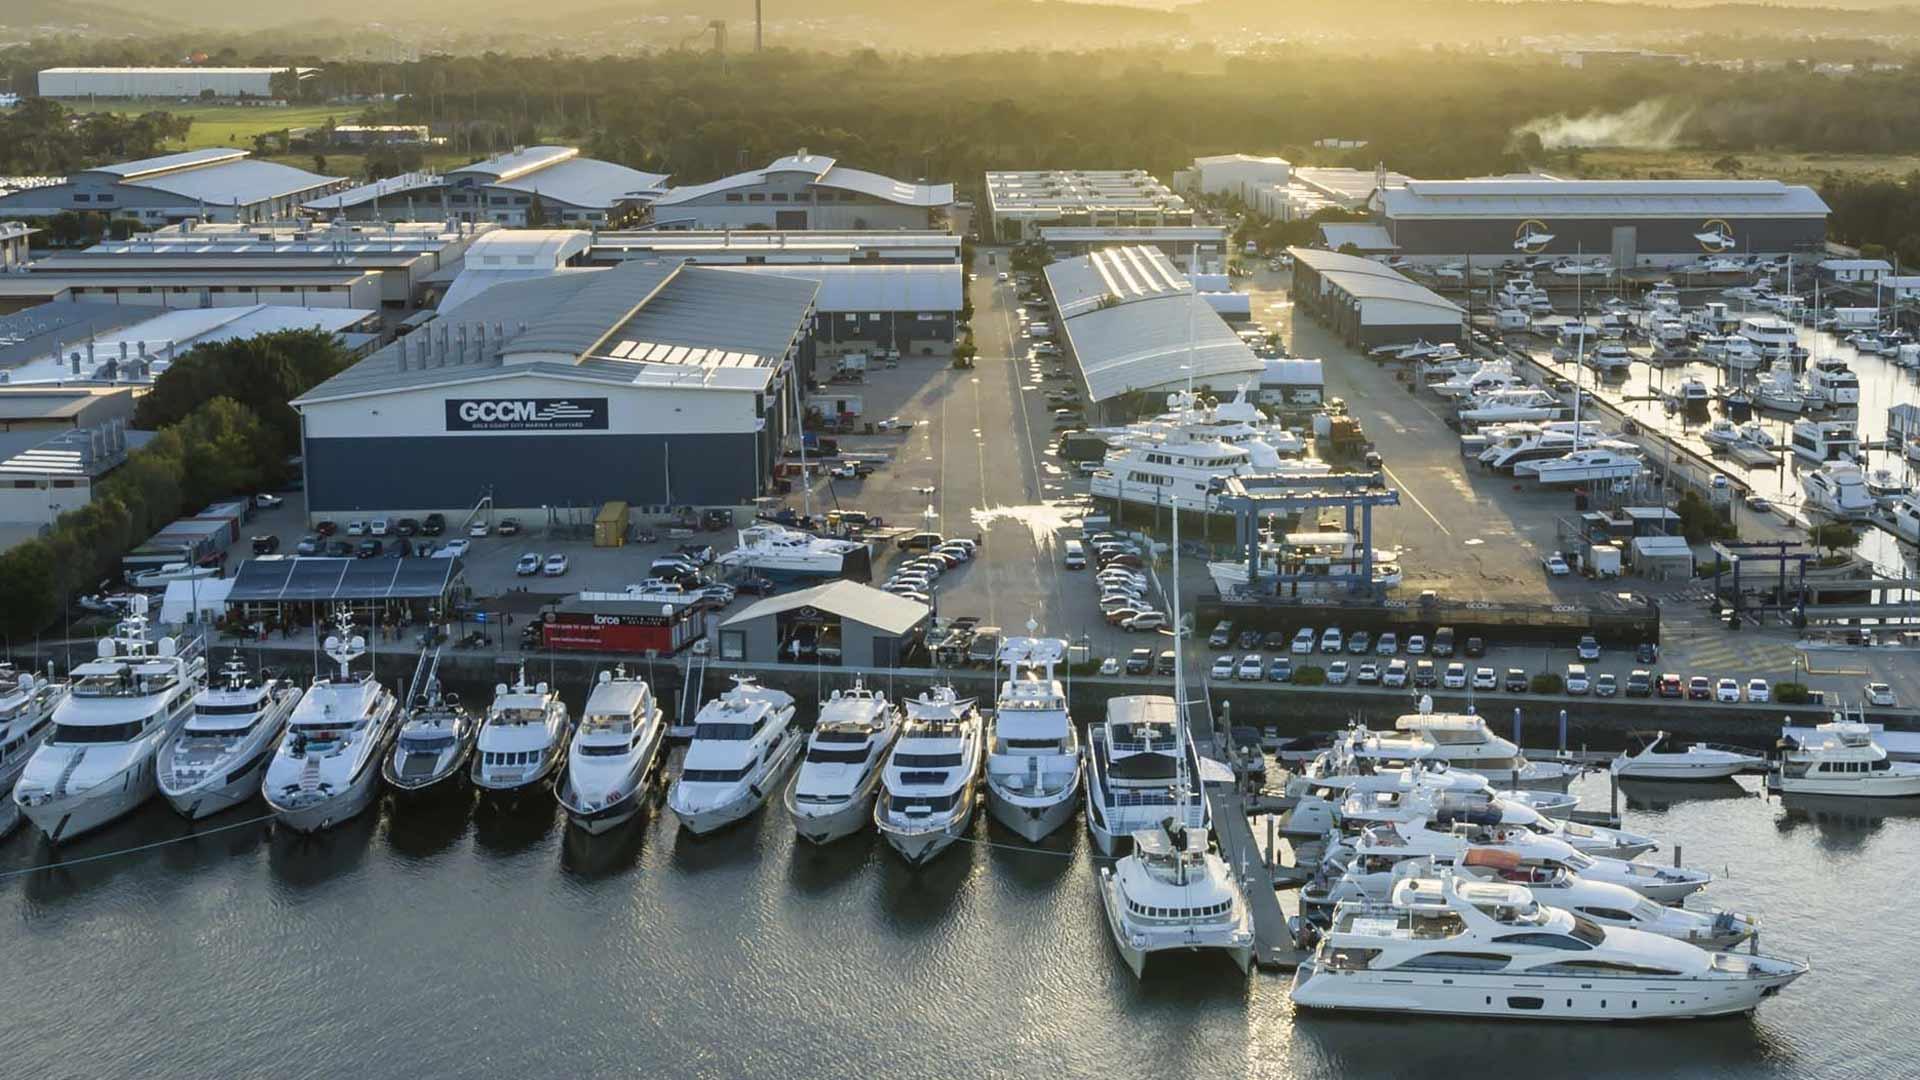 Adagold Aviation | superyacht rendezvous | Australian tourism